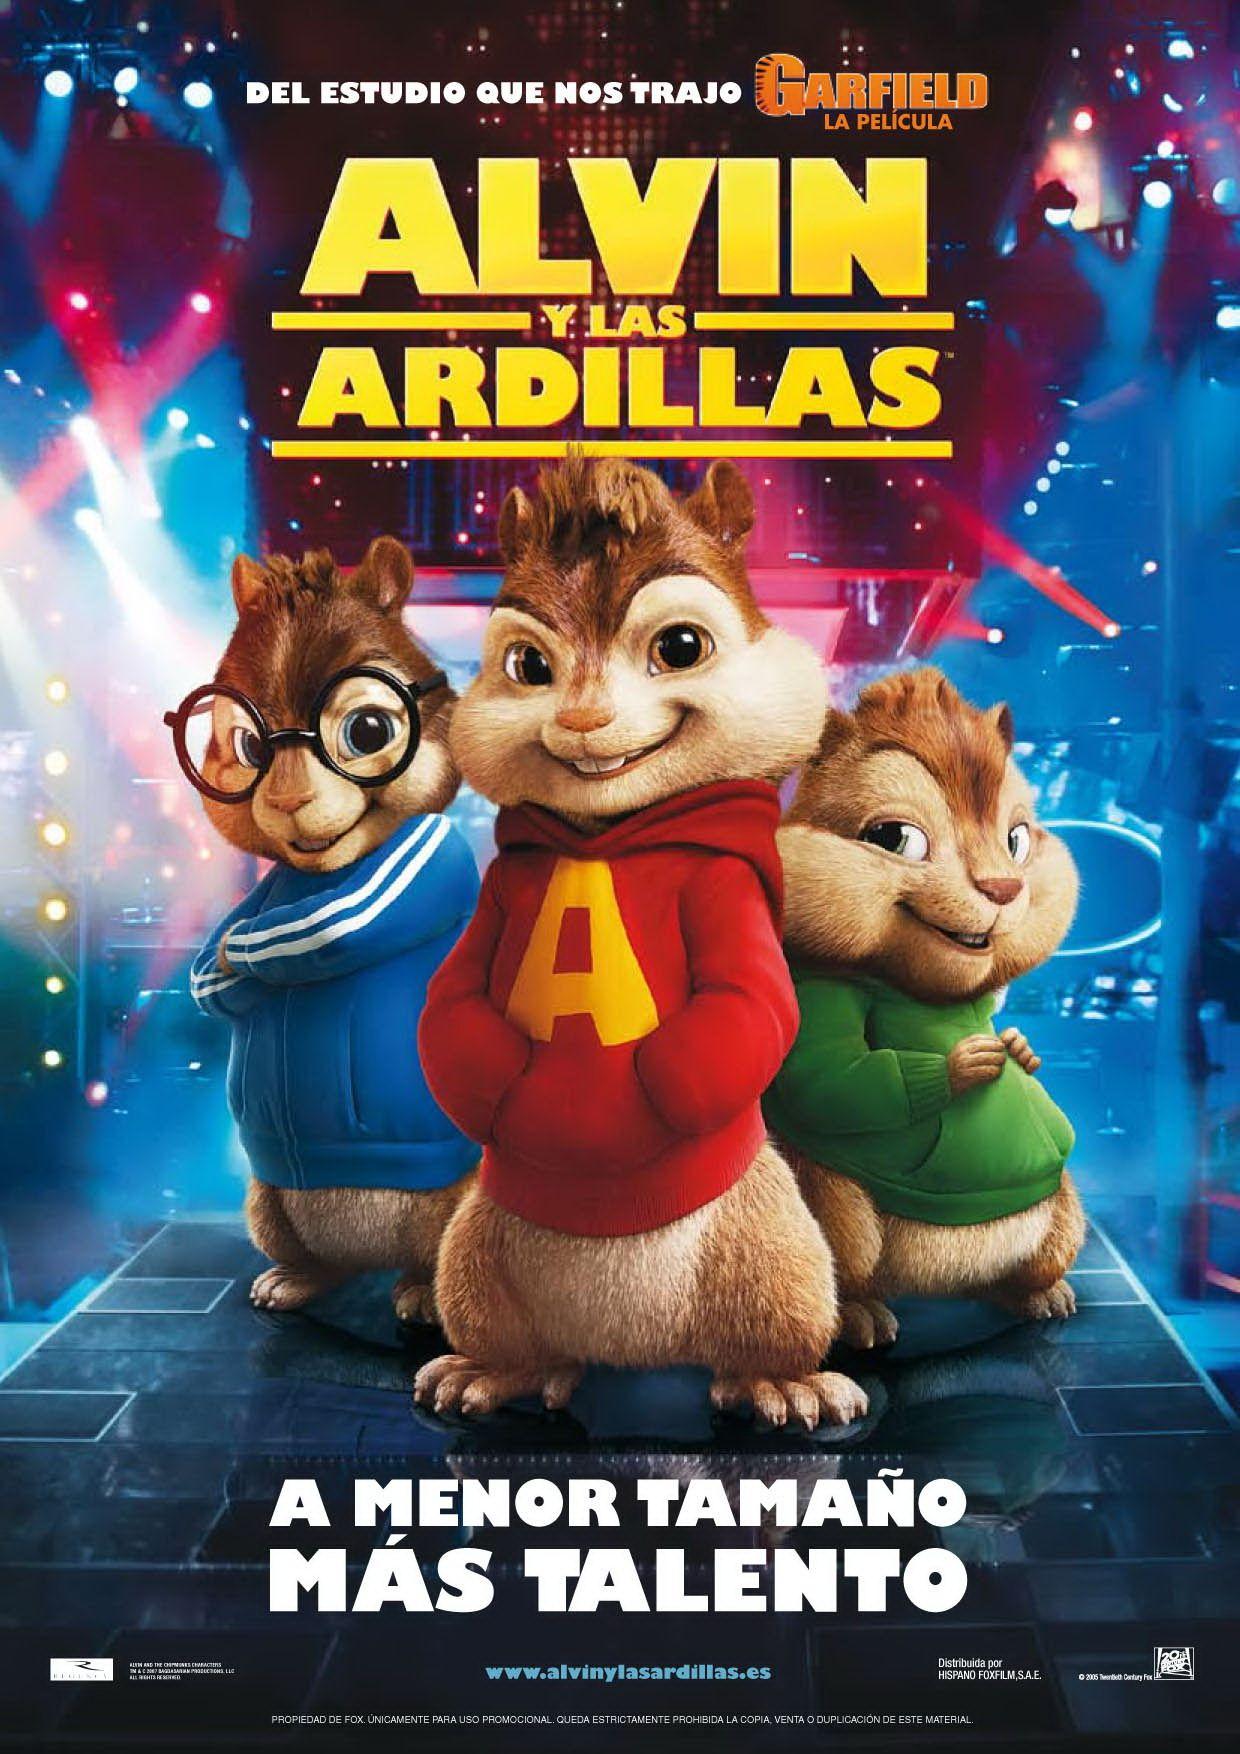 Alvin Y Las Ardillas Chipmunks Movie And Chipmunks Movie